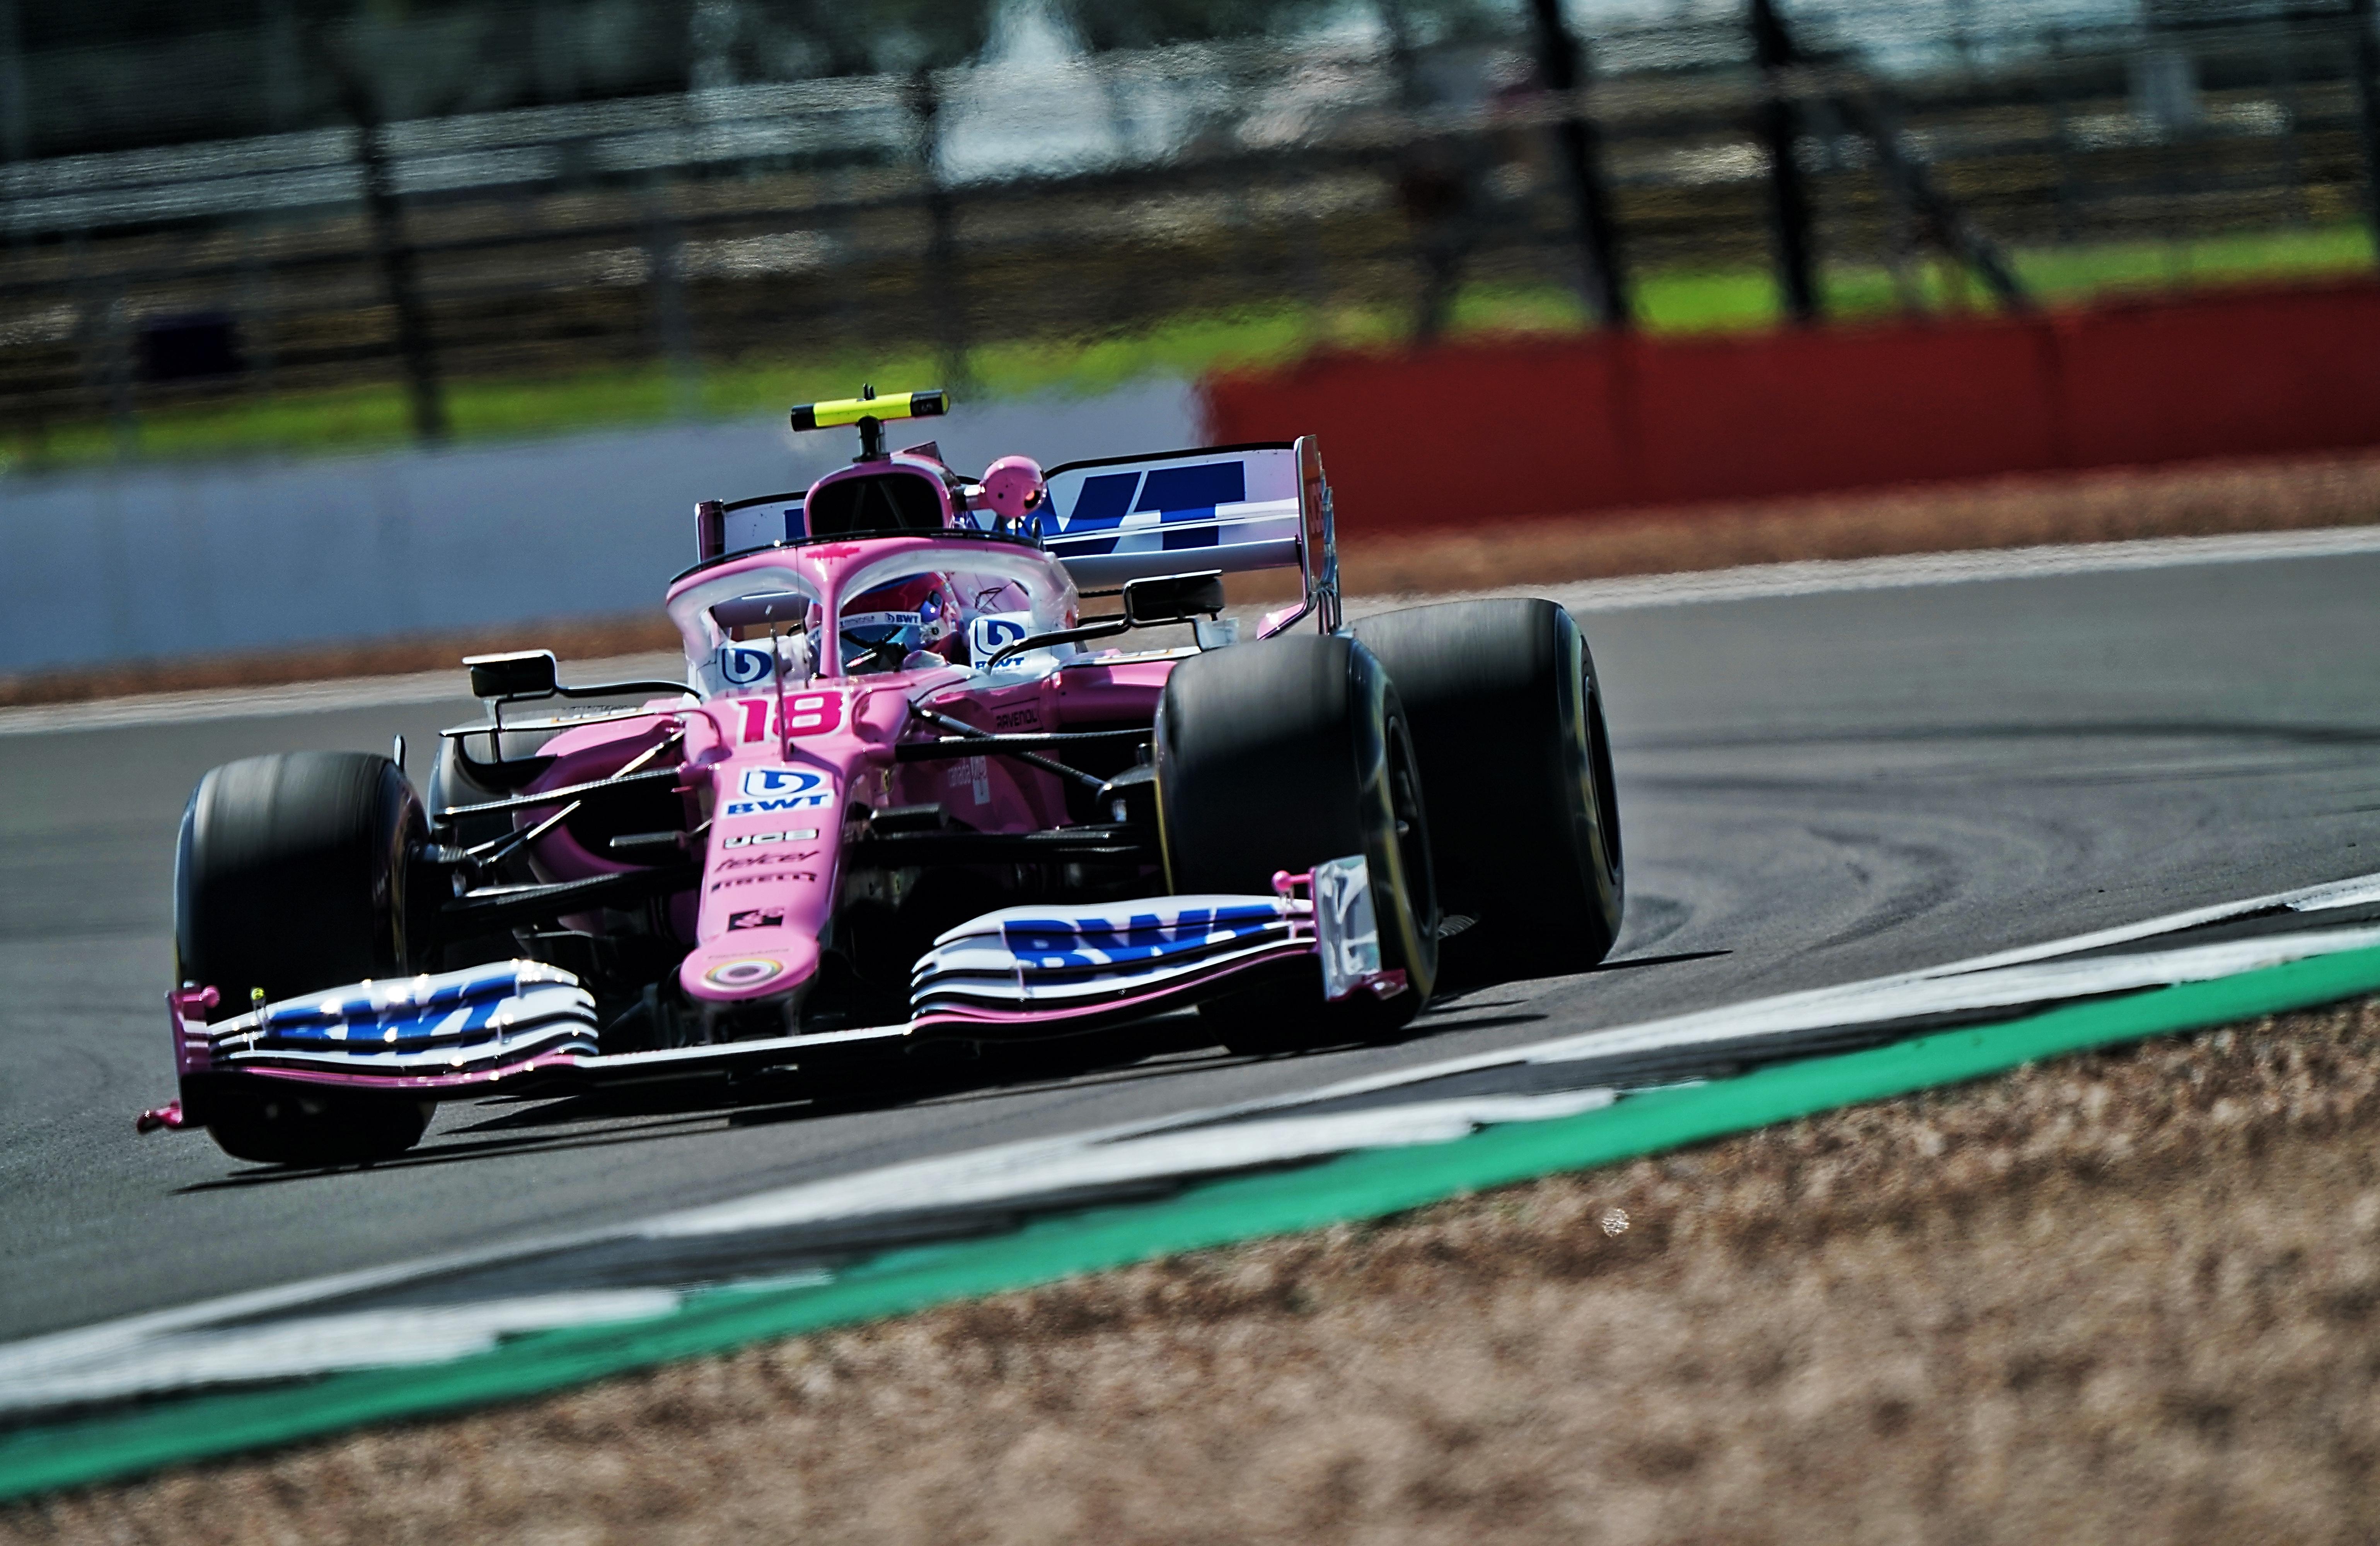 Lance Stroll Racing Point British Grand Prix practice 2020 Silverstone